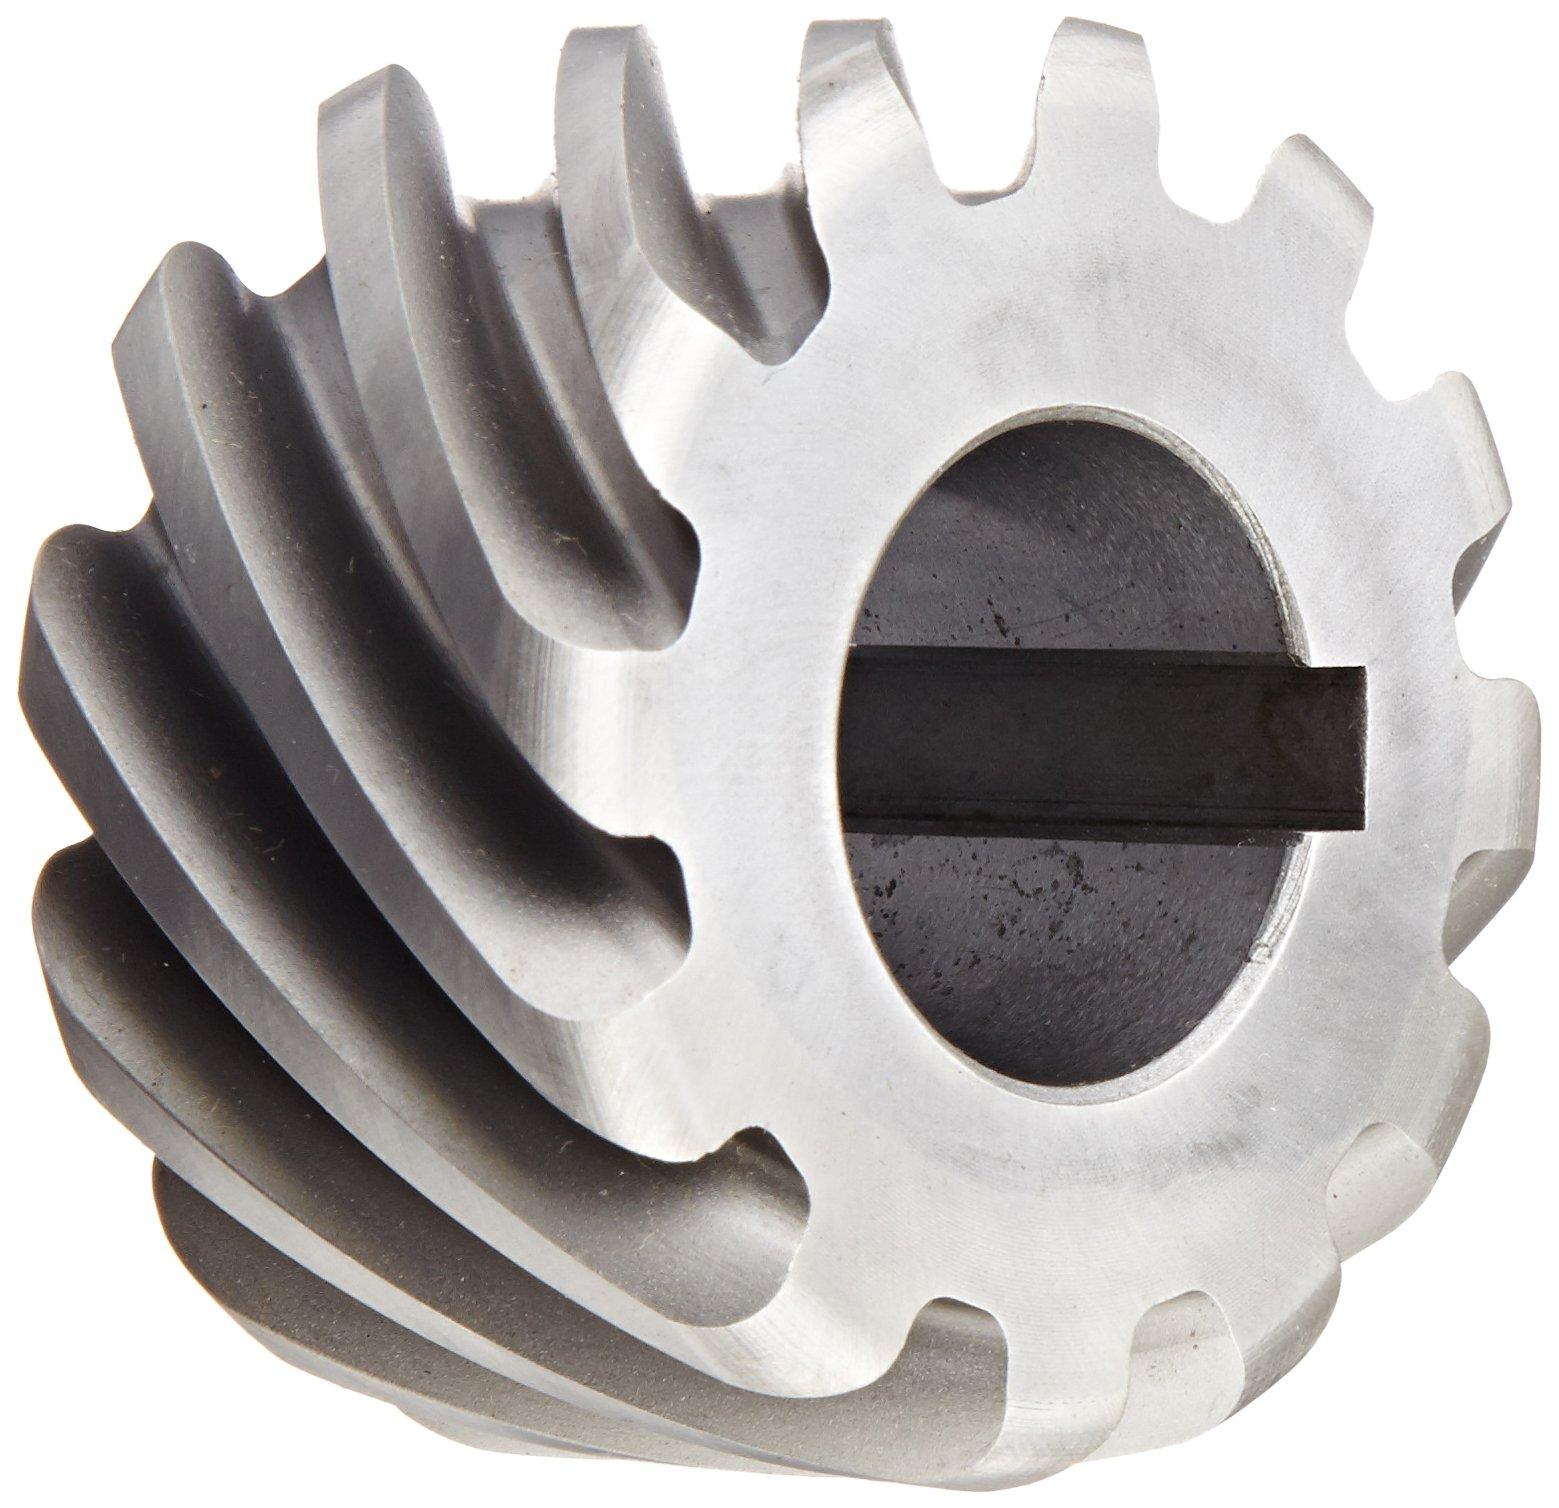 Boston Gear H1012L Plain Helical Gear 45 Degree Helix LH 14.5 Degree Pressure Angle 0.625 Bore 10 Pitch 12 Teeth Steel